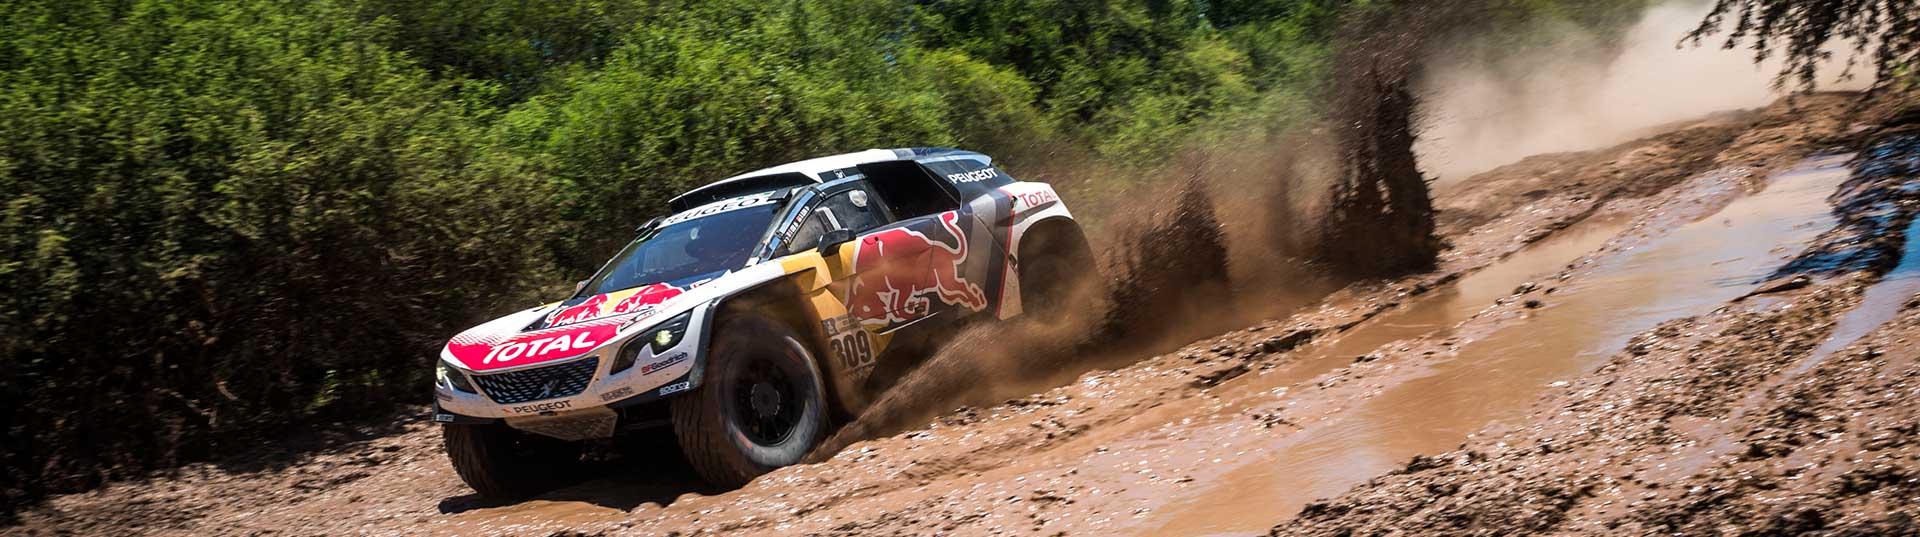 Sébastien Loeb vence dia 2 Dakar